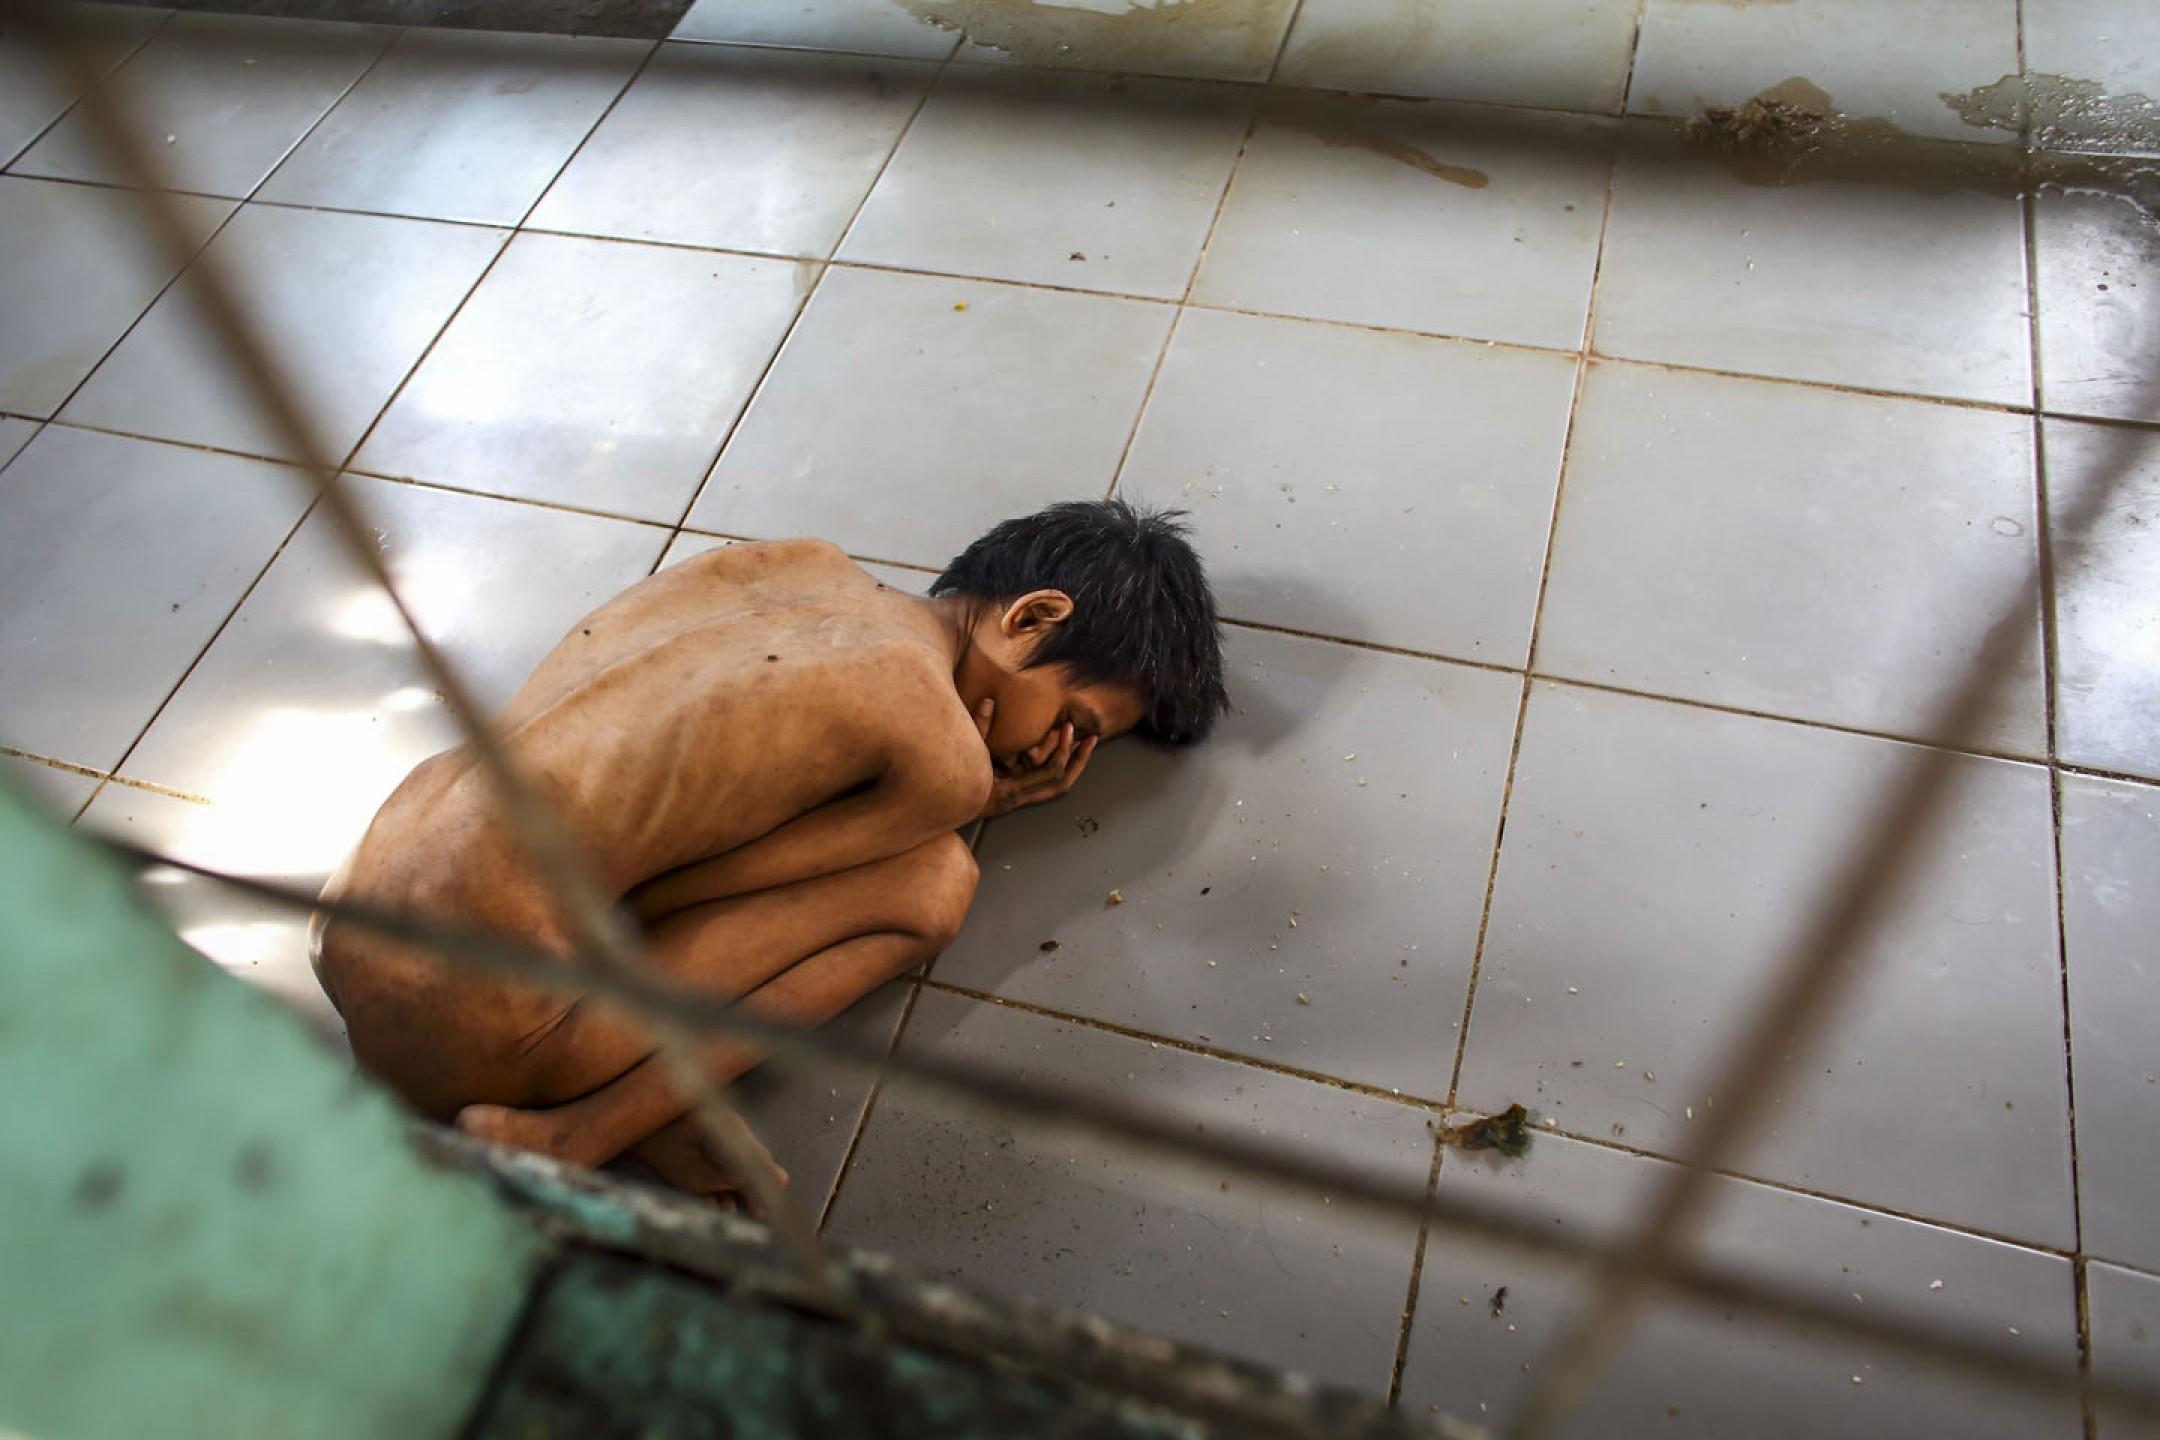 Mental hospital in Indonesia